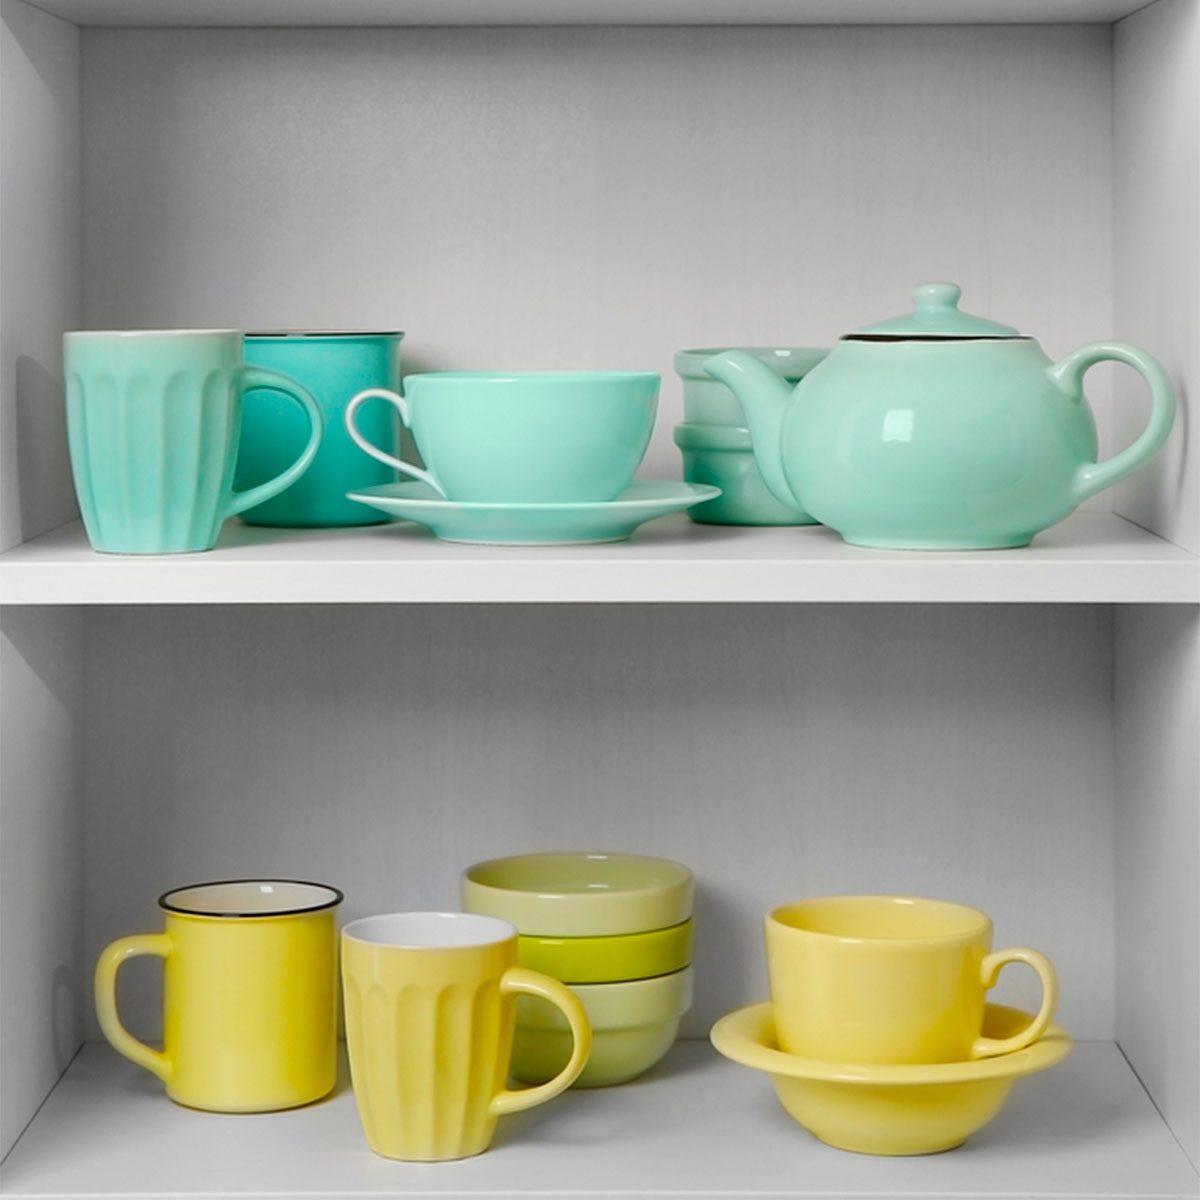 idee-appendere-sistemare-tazze-cucina-1